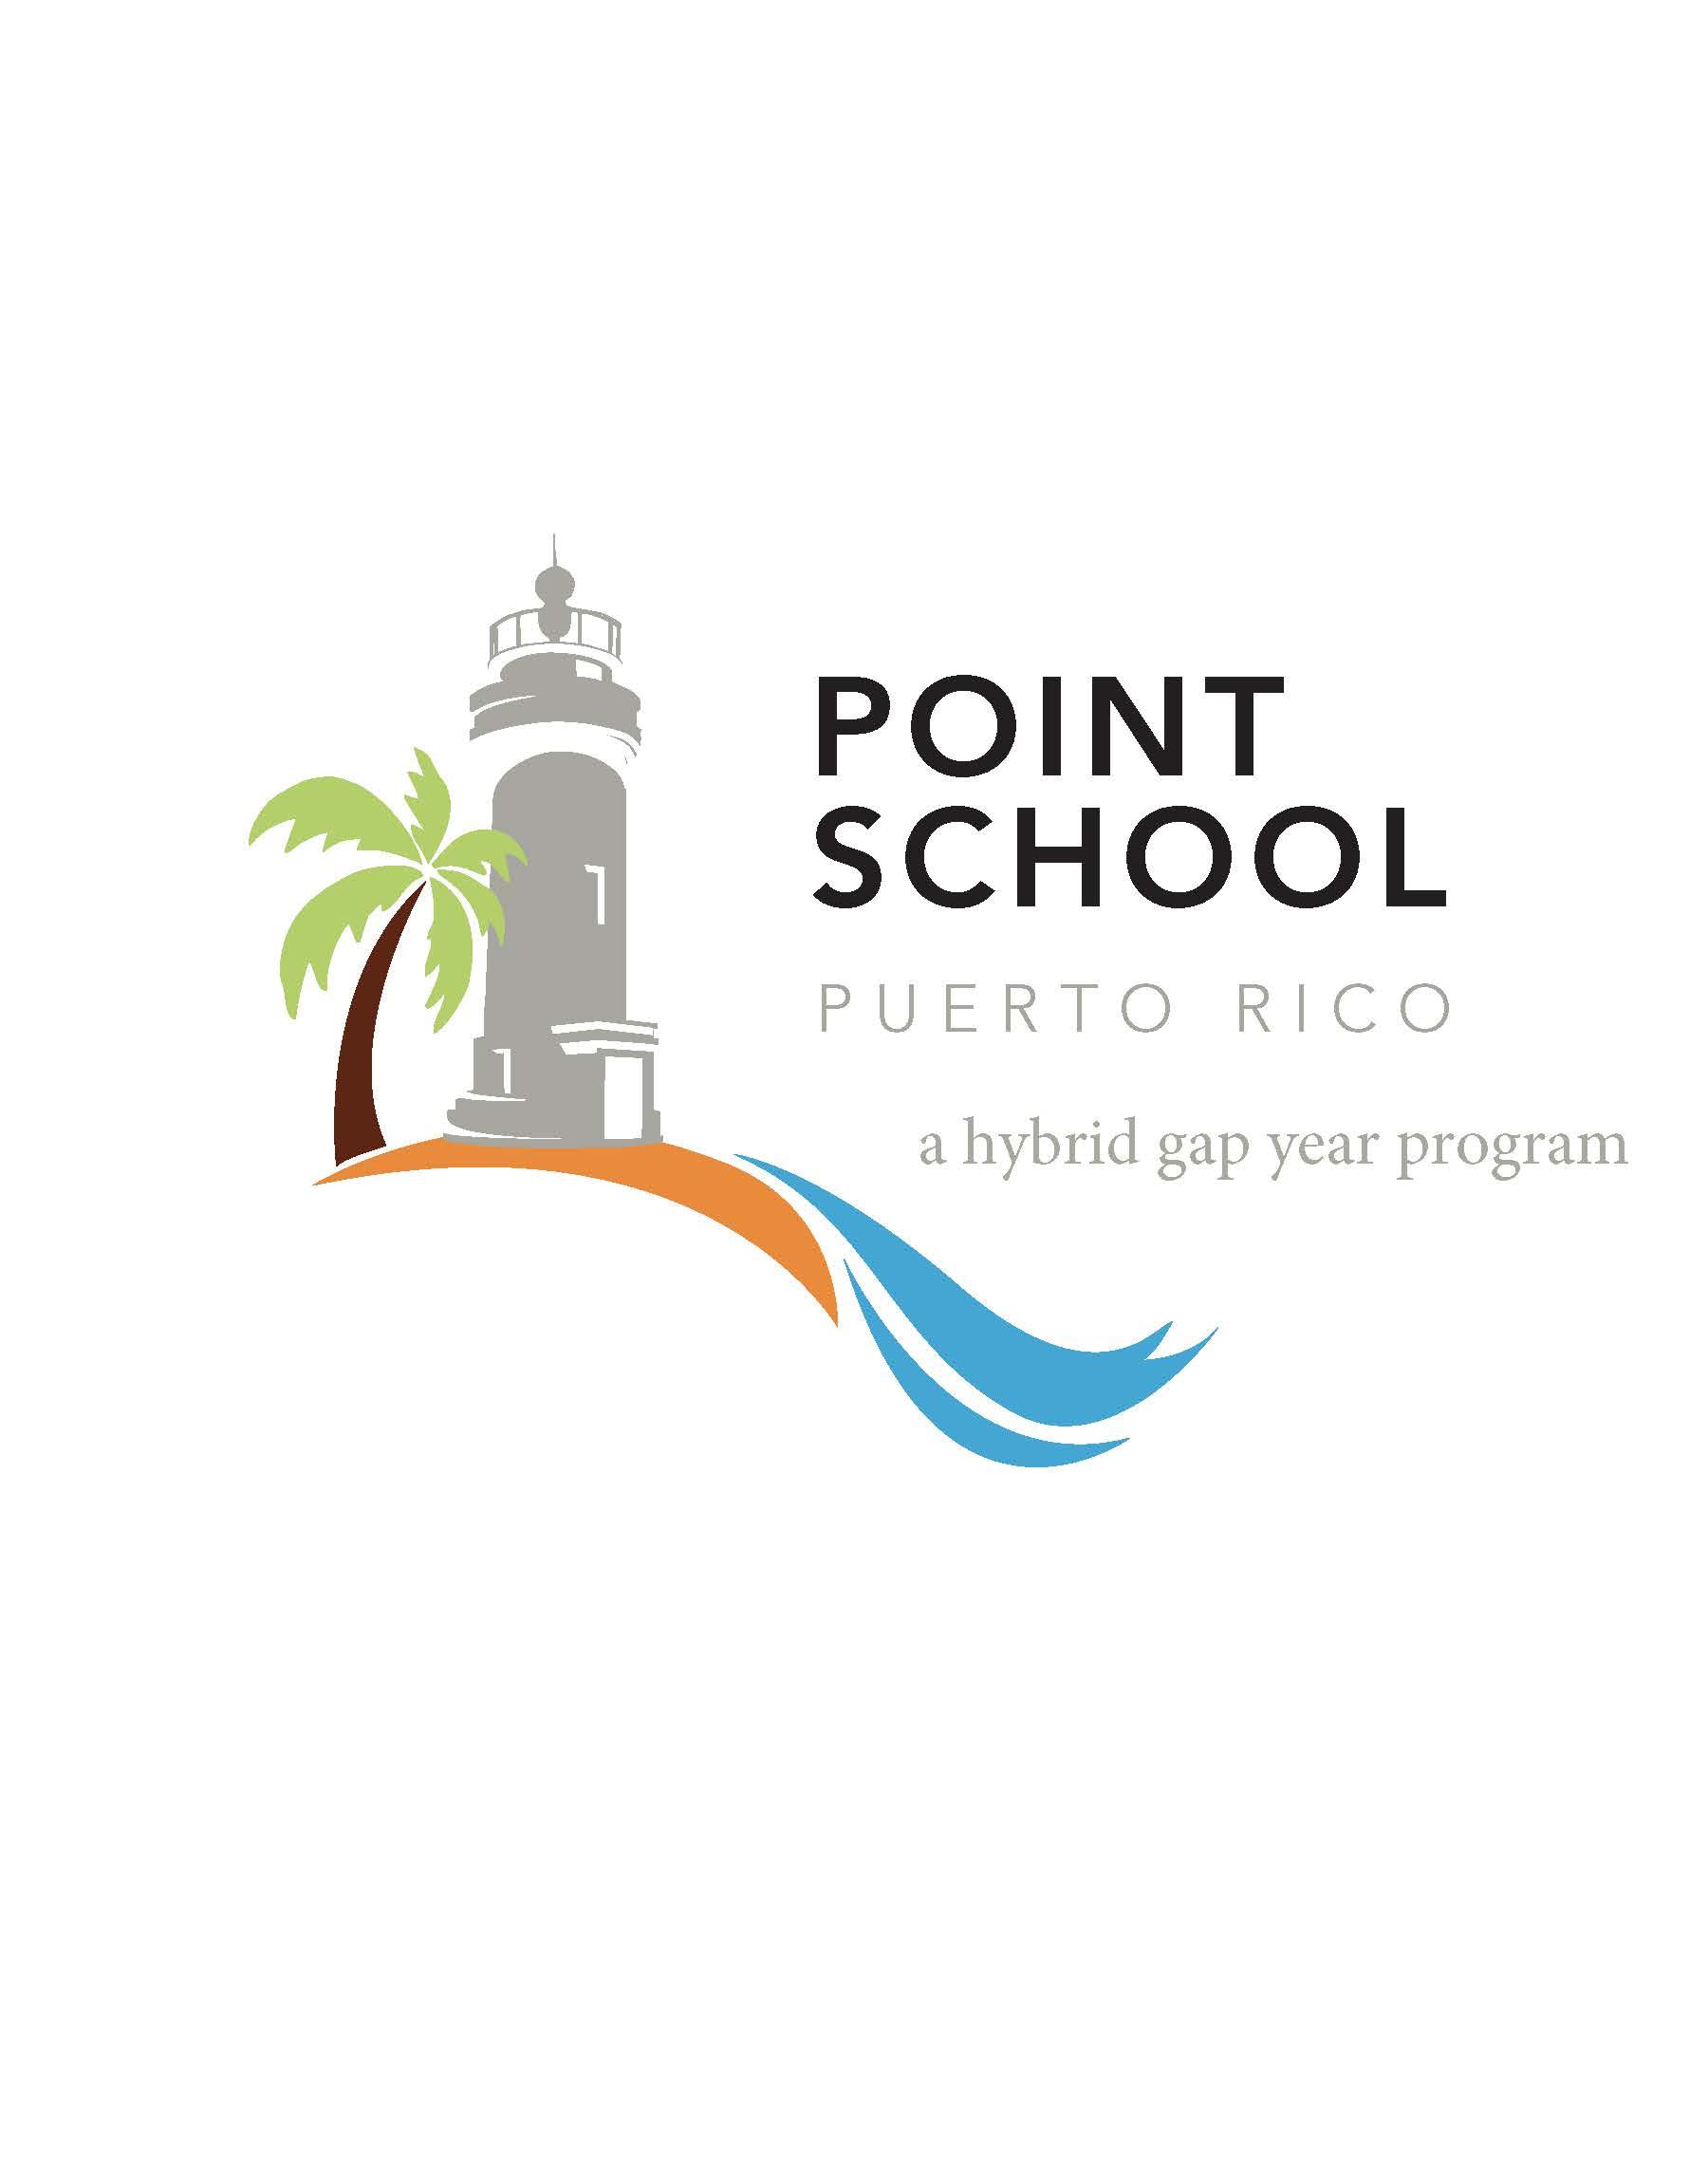 Point School Puerto Rico